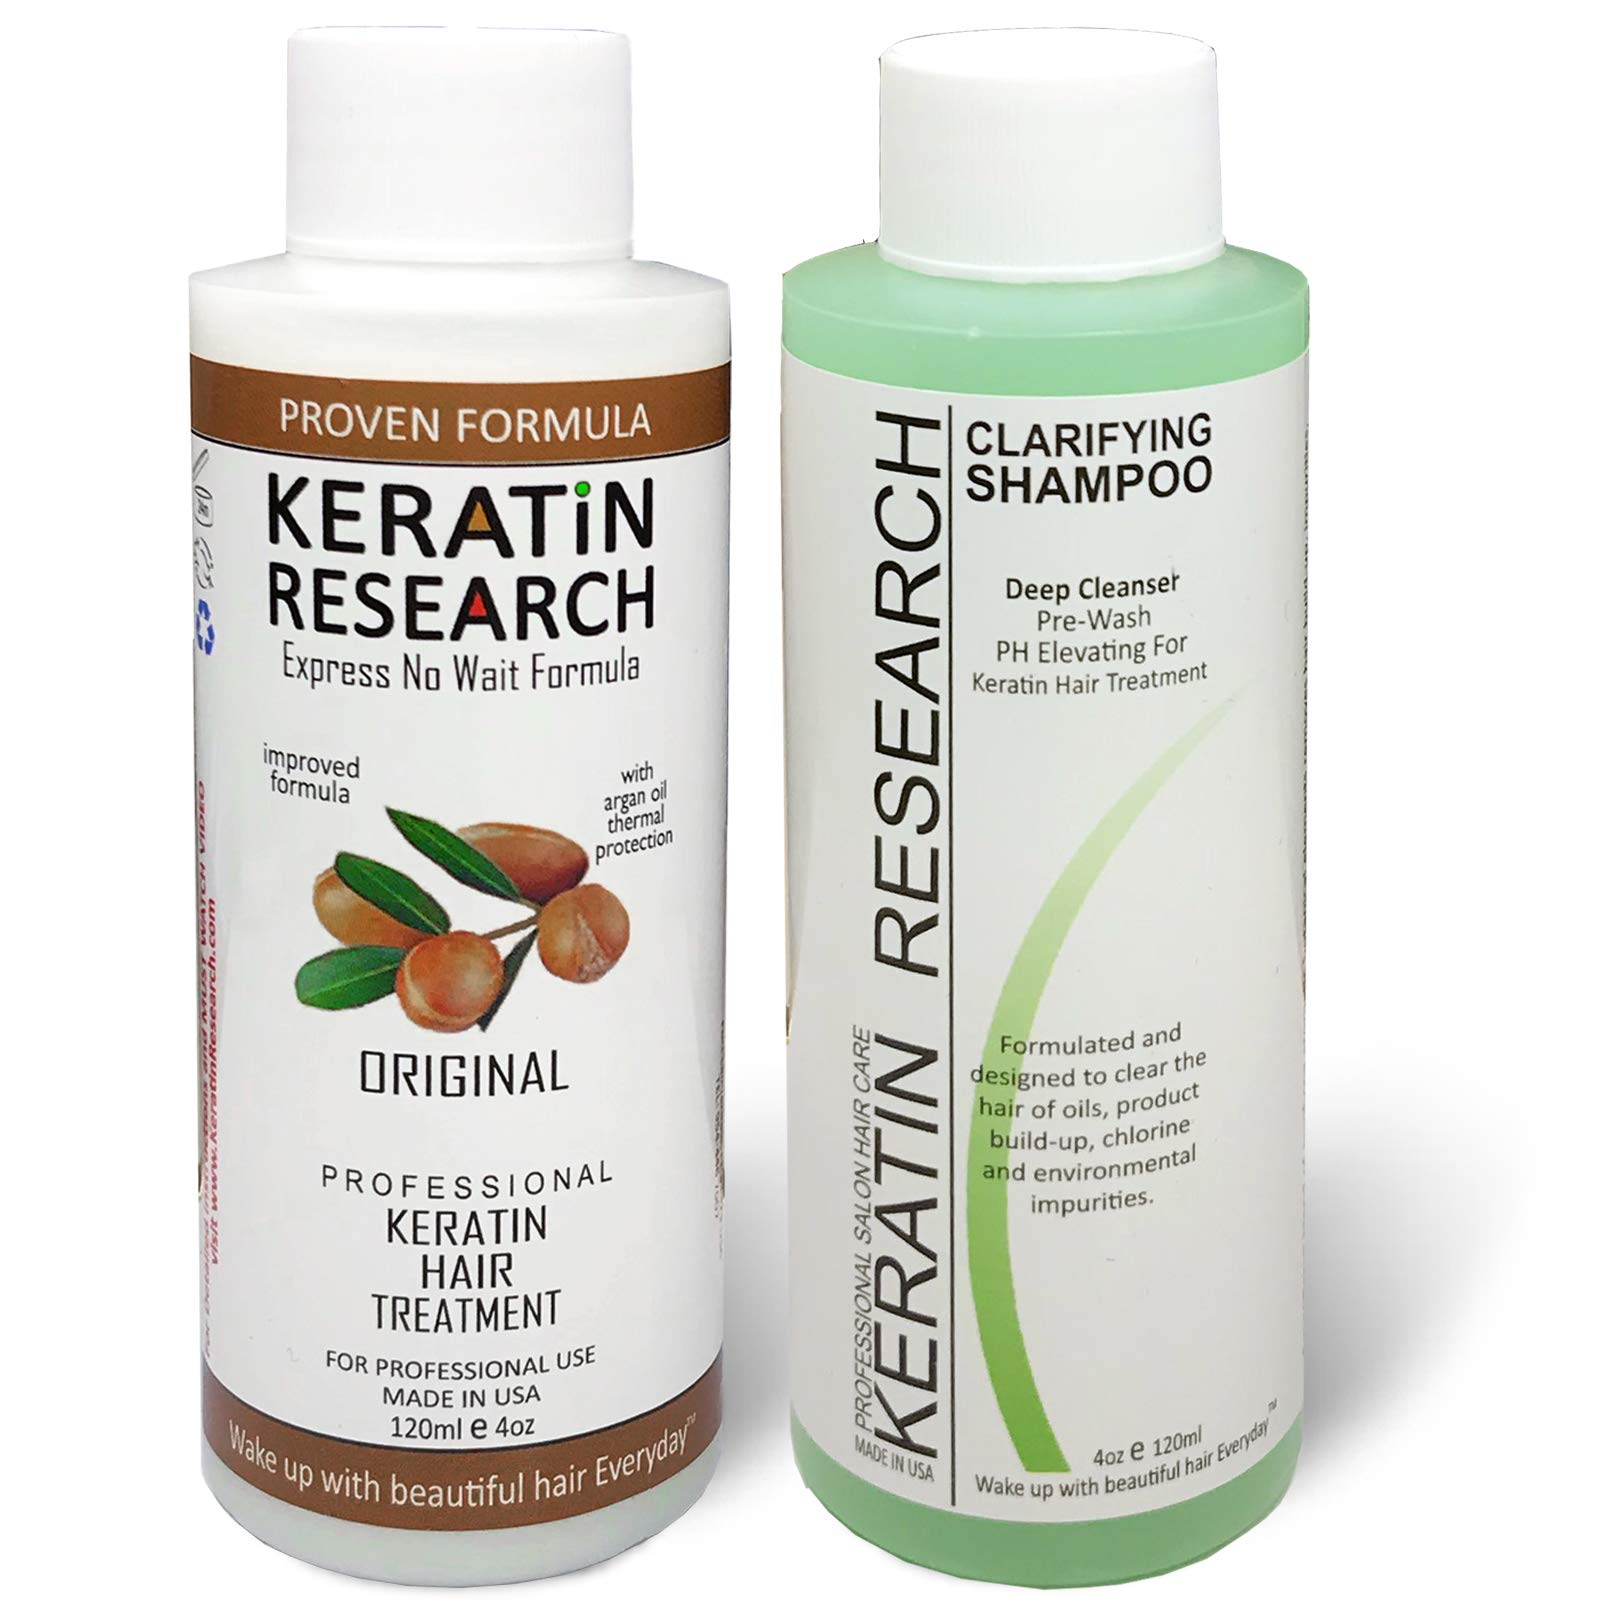 Complex Brazilian Keratin Hair Blowout Treatment Professional Results Straighten and Smooths Hair 120ml Queratina Keratina Brasilera Tratamiento by KERATIN RESEARCH